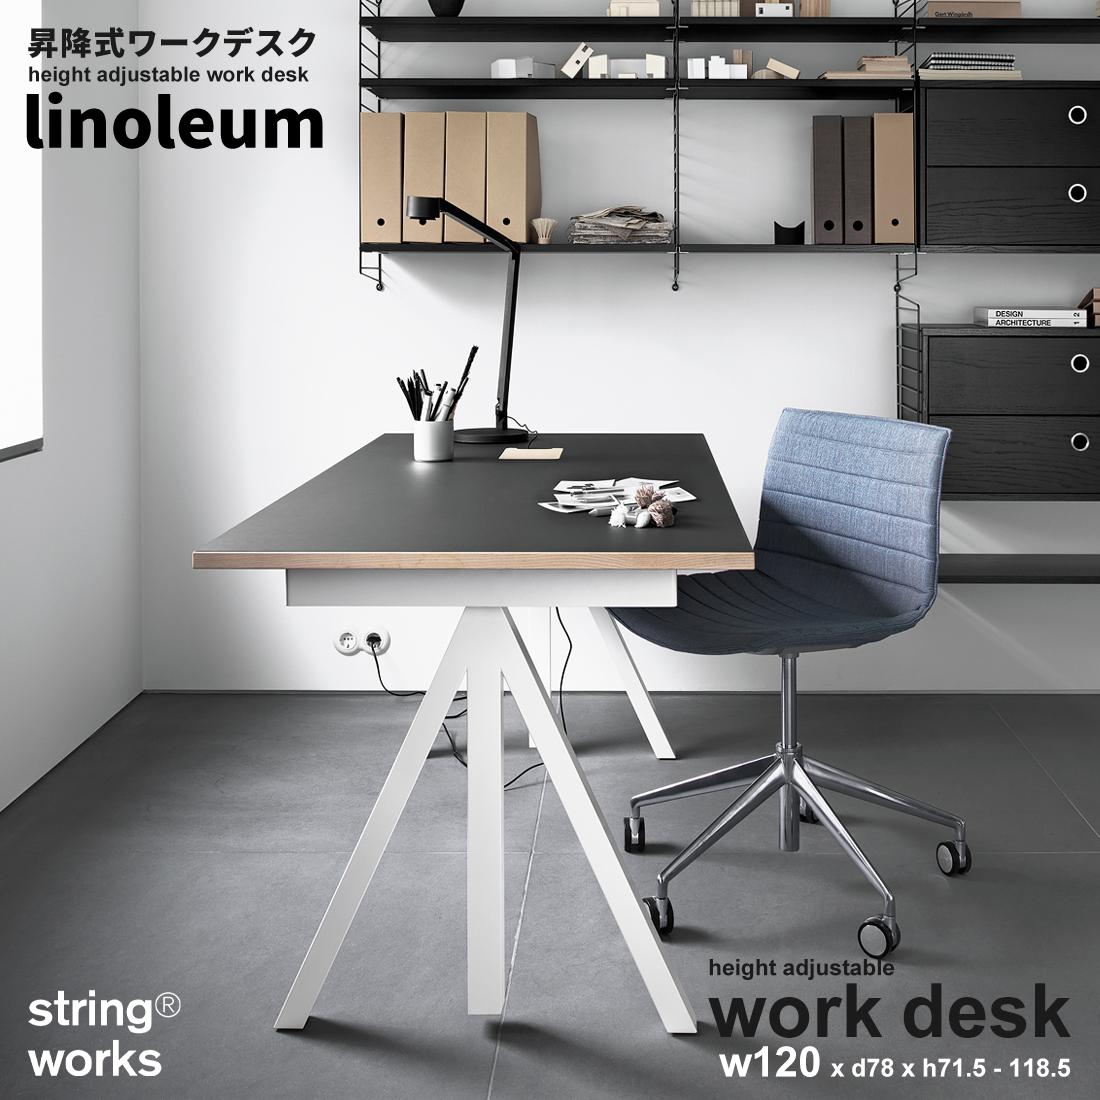 【string ストリング】string works desk ストリング ワークス 昇降式デスク W120cm リノリウム机 テーブル 作業台 折りたたみ式 折り畳みテーブル ダイニングテーブル